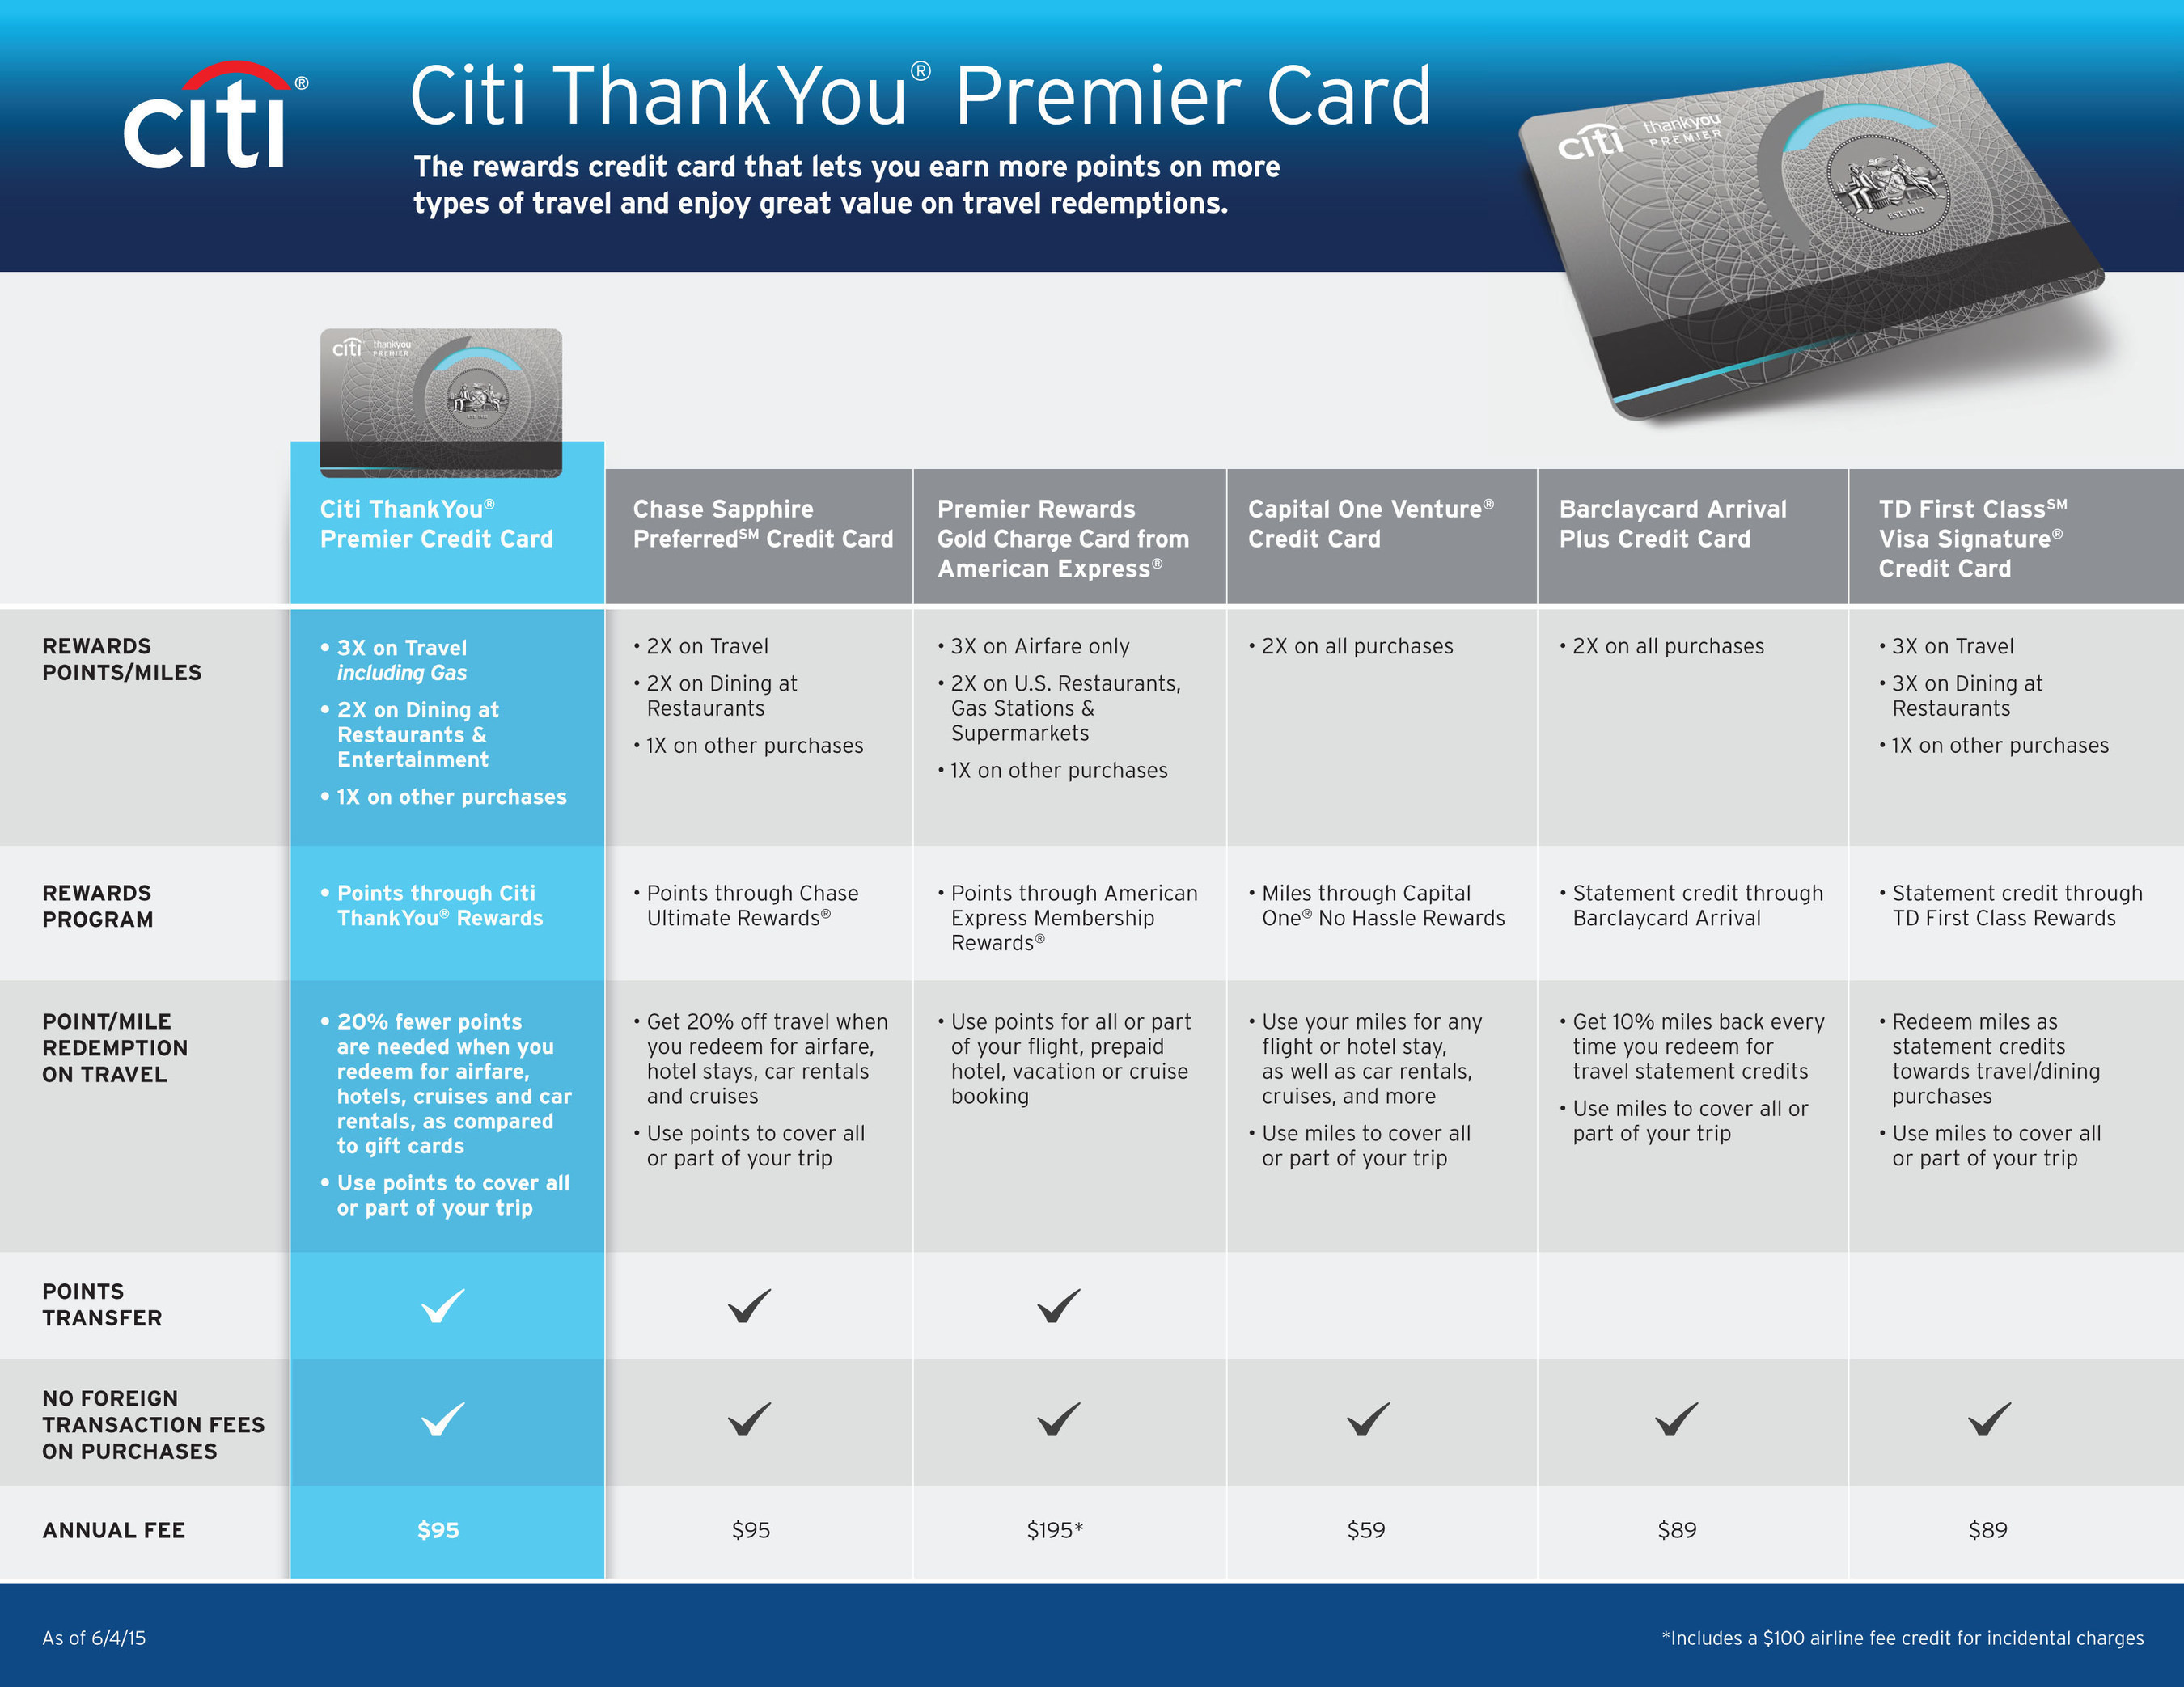 Citi thankyou premier commuter index reveals us consumers spend an citi thankyou premier card comparison chart colourmoves Image collections